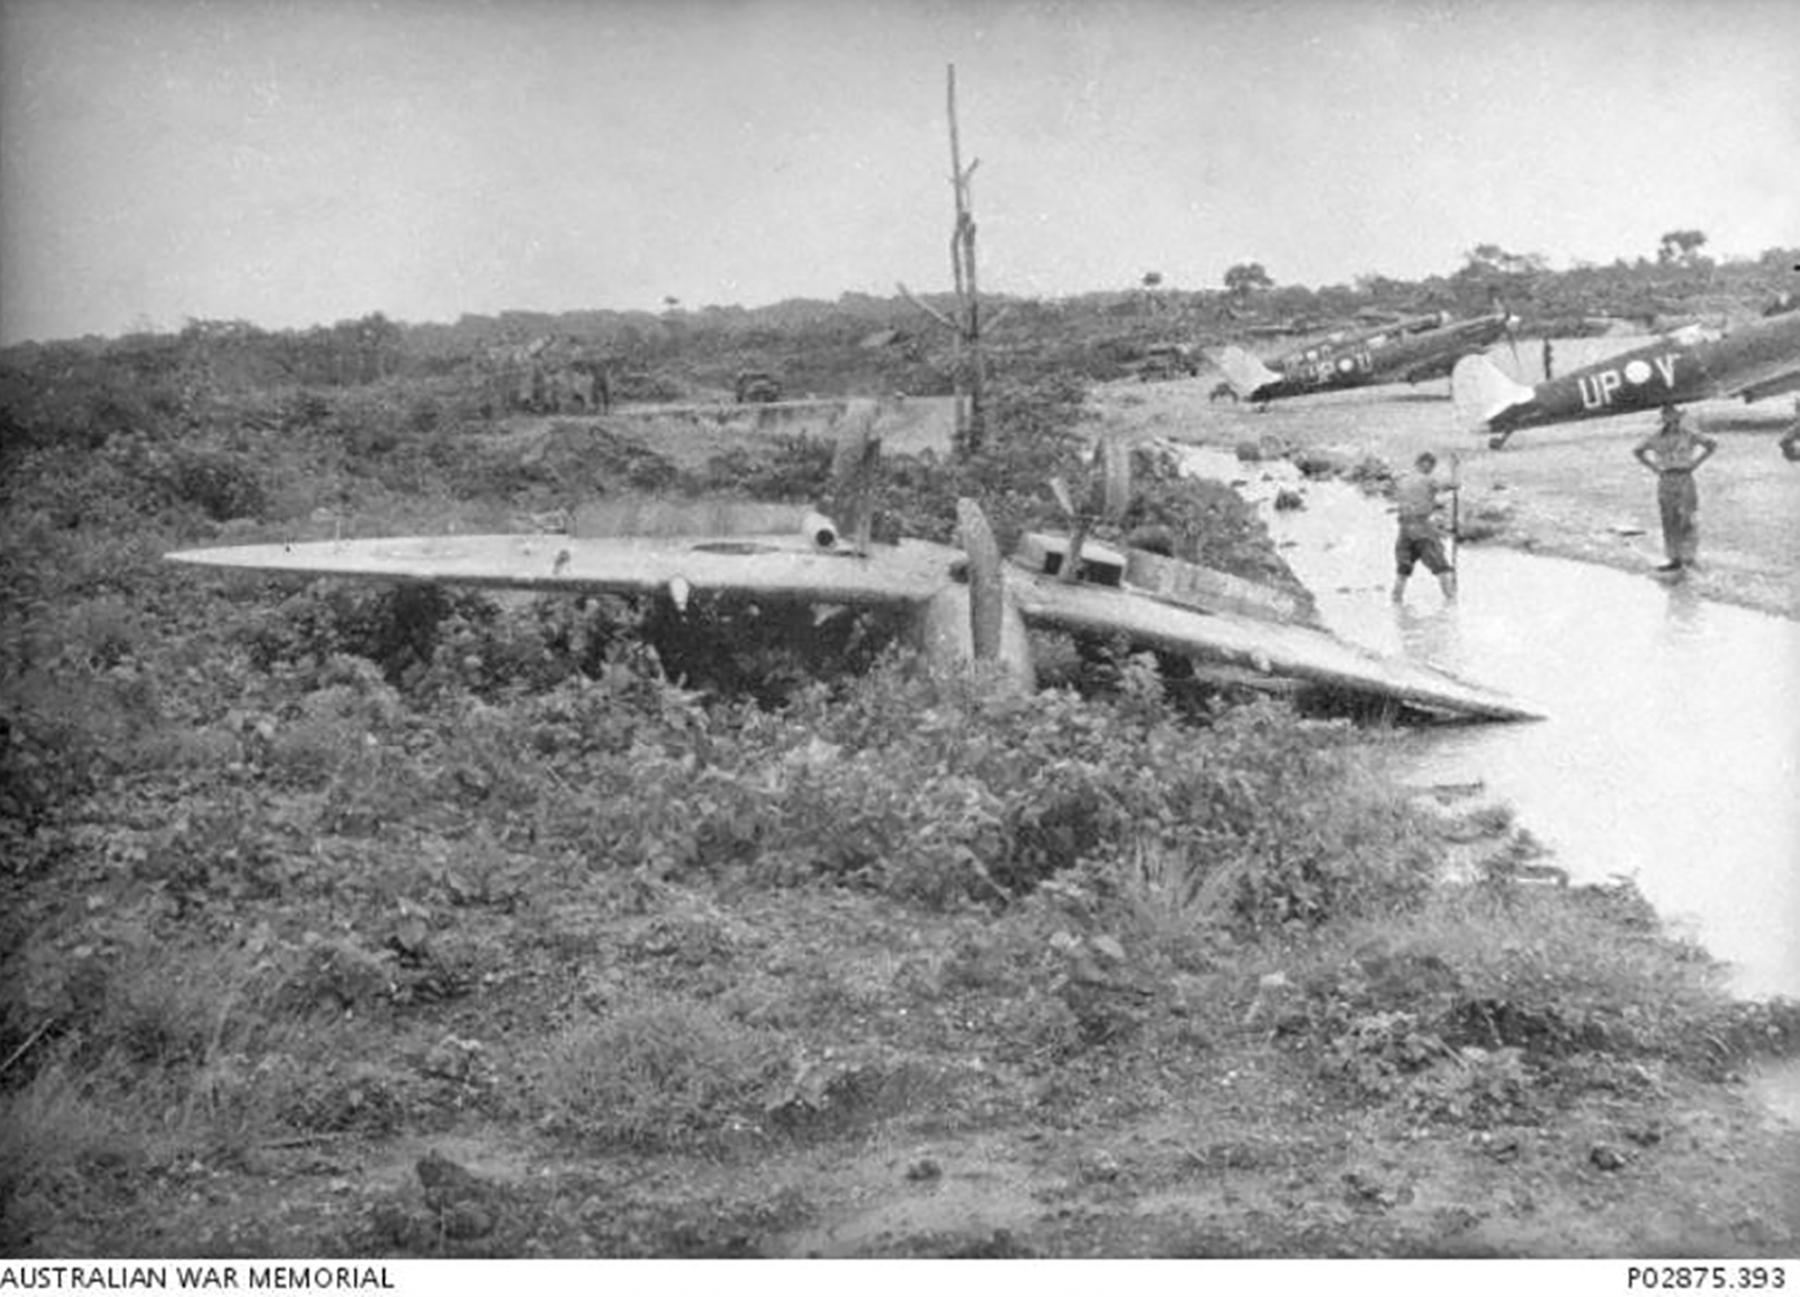 Spitfire MkVc RAAF 79Sqn UPG A58 178 landing accident Kiriwina 12 Jan 1944 AWM 01